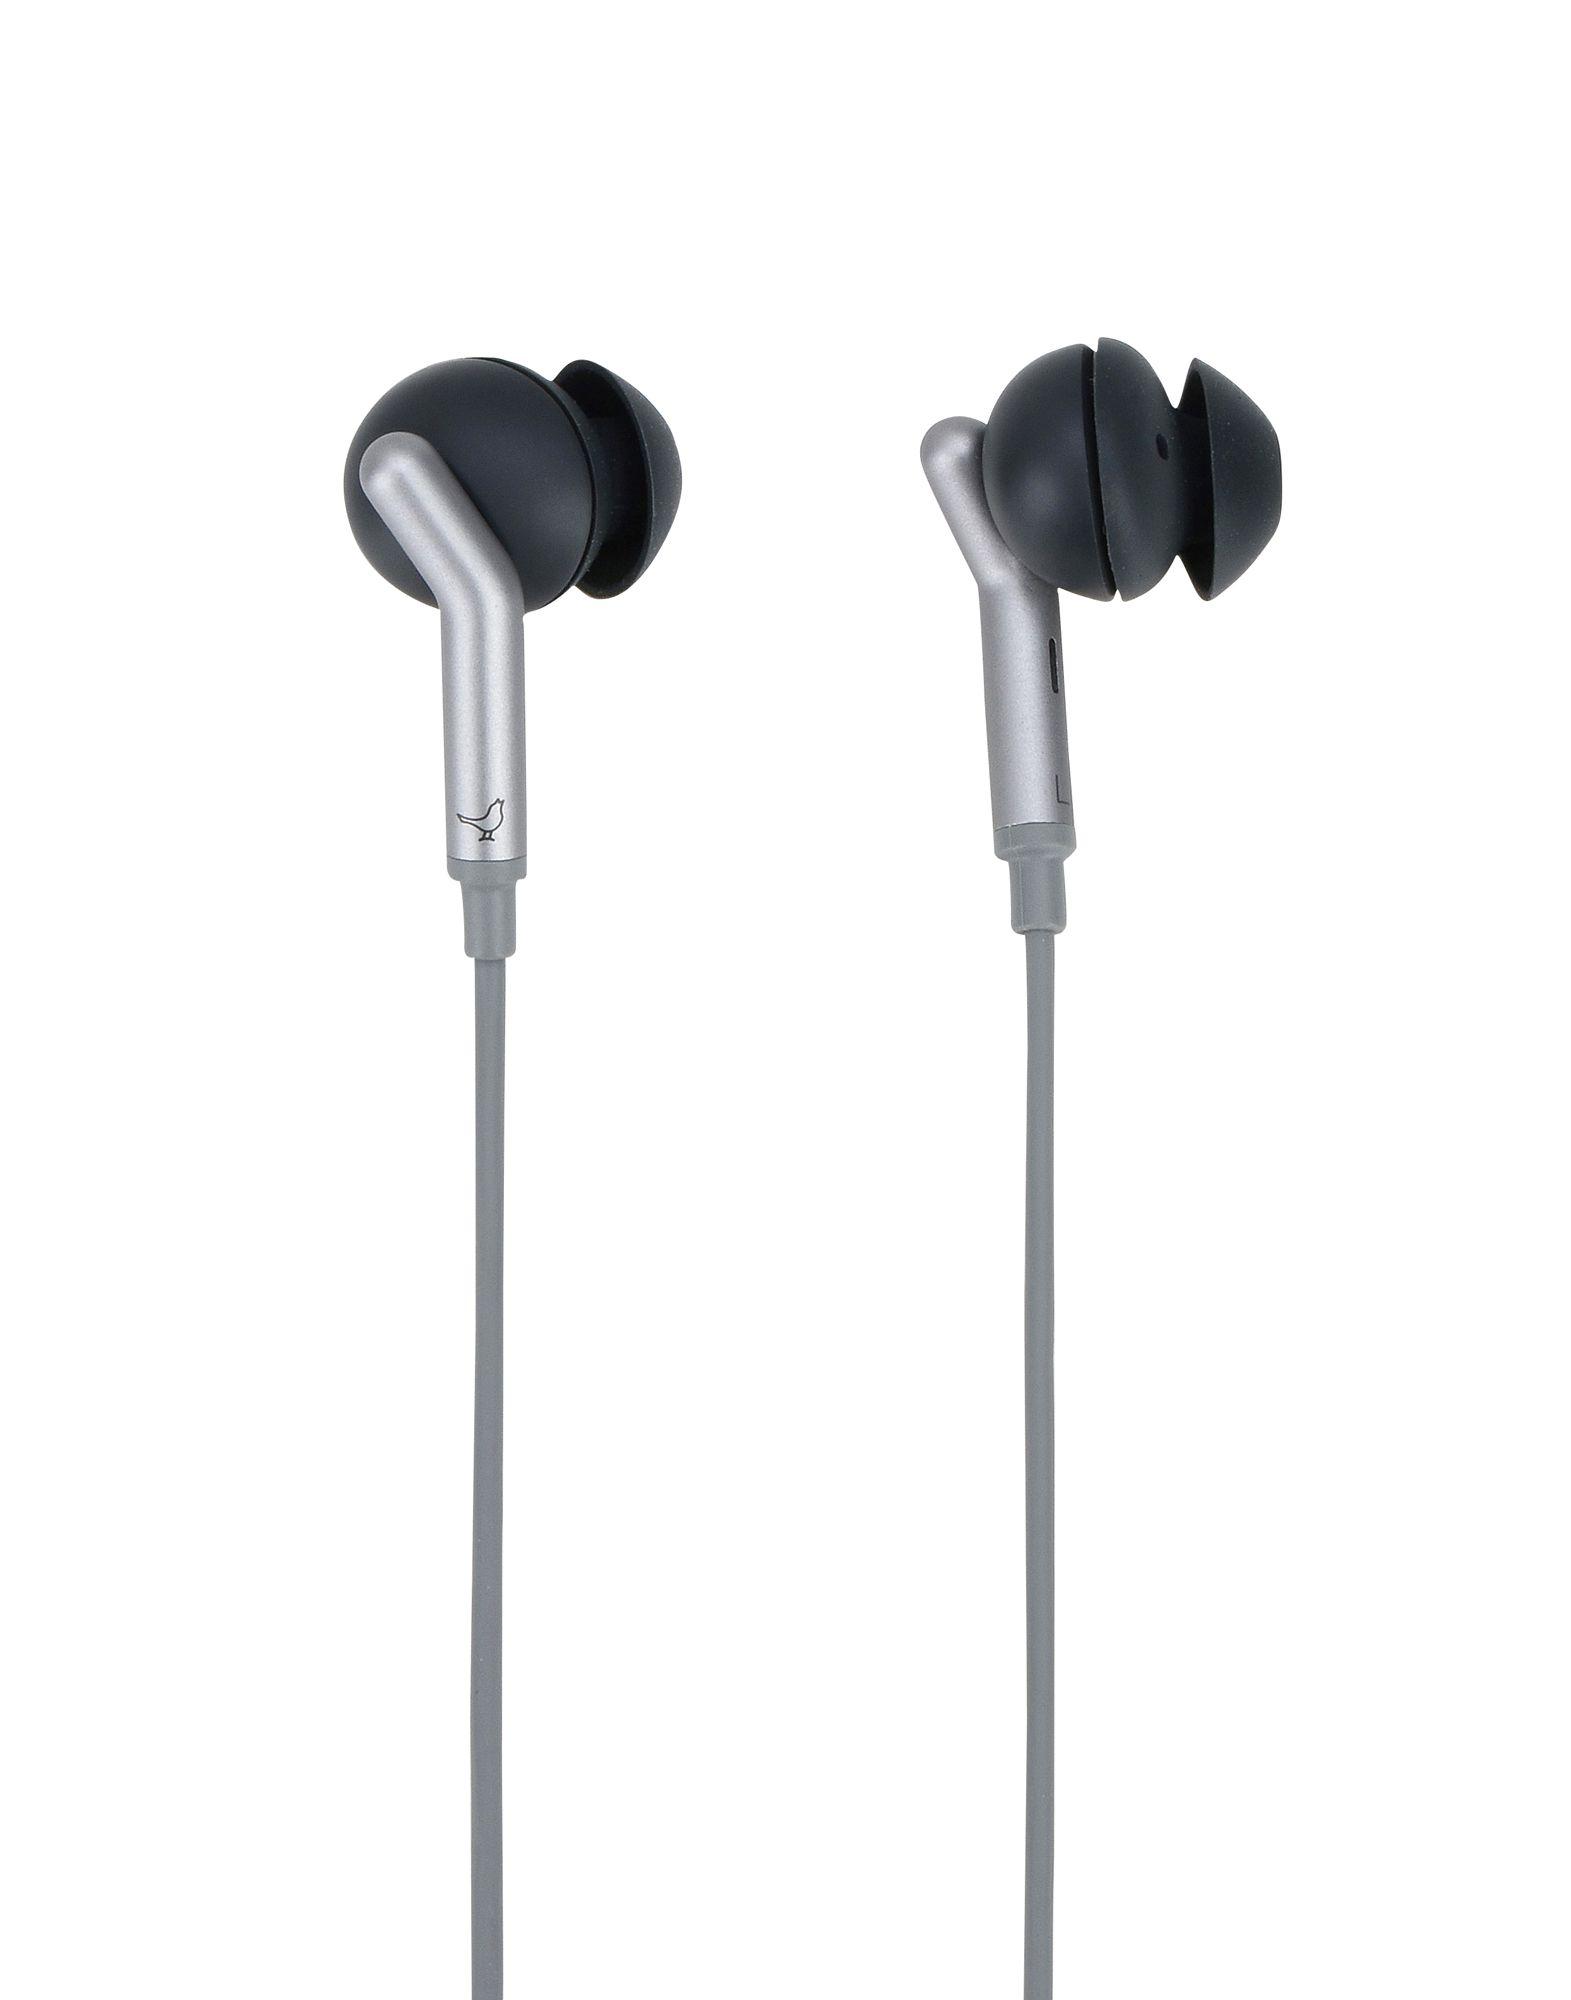 Cuffie Libratone Q Adapt Anc In-Ear Lightning Stormy Black - Uomo - Acquista online su